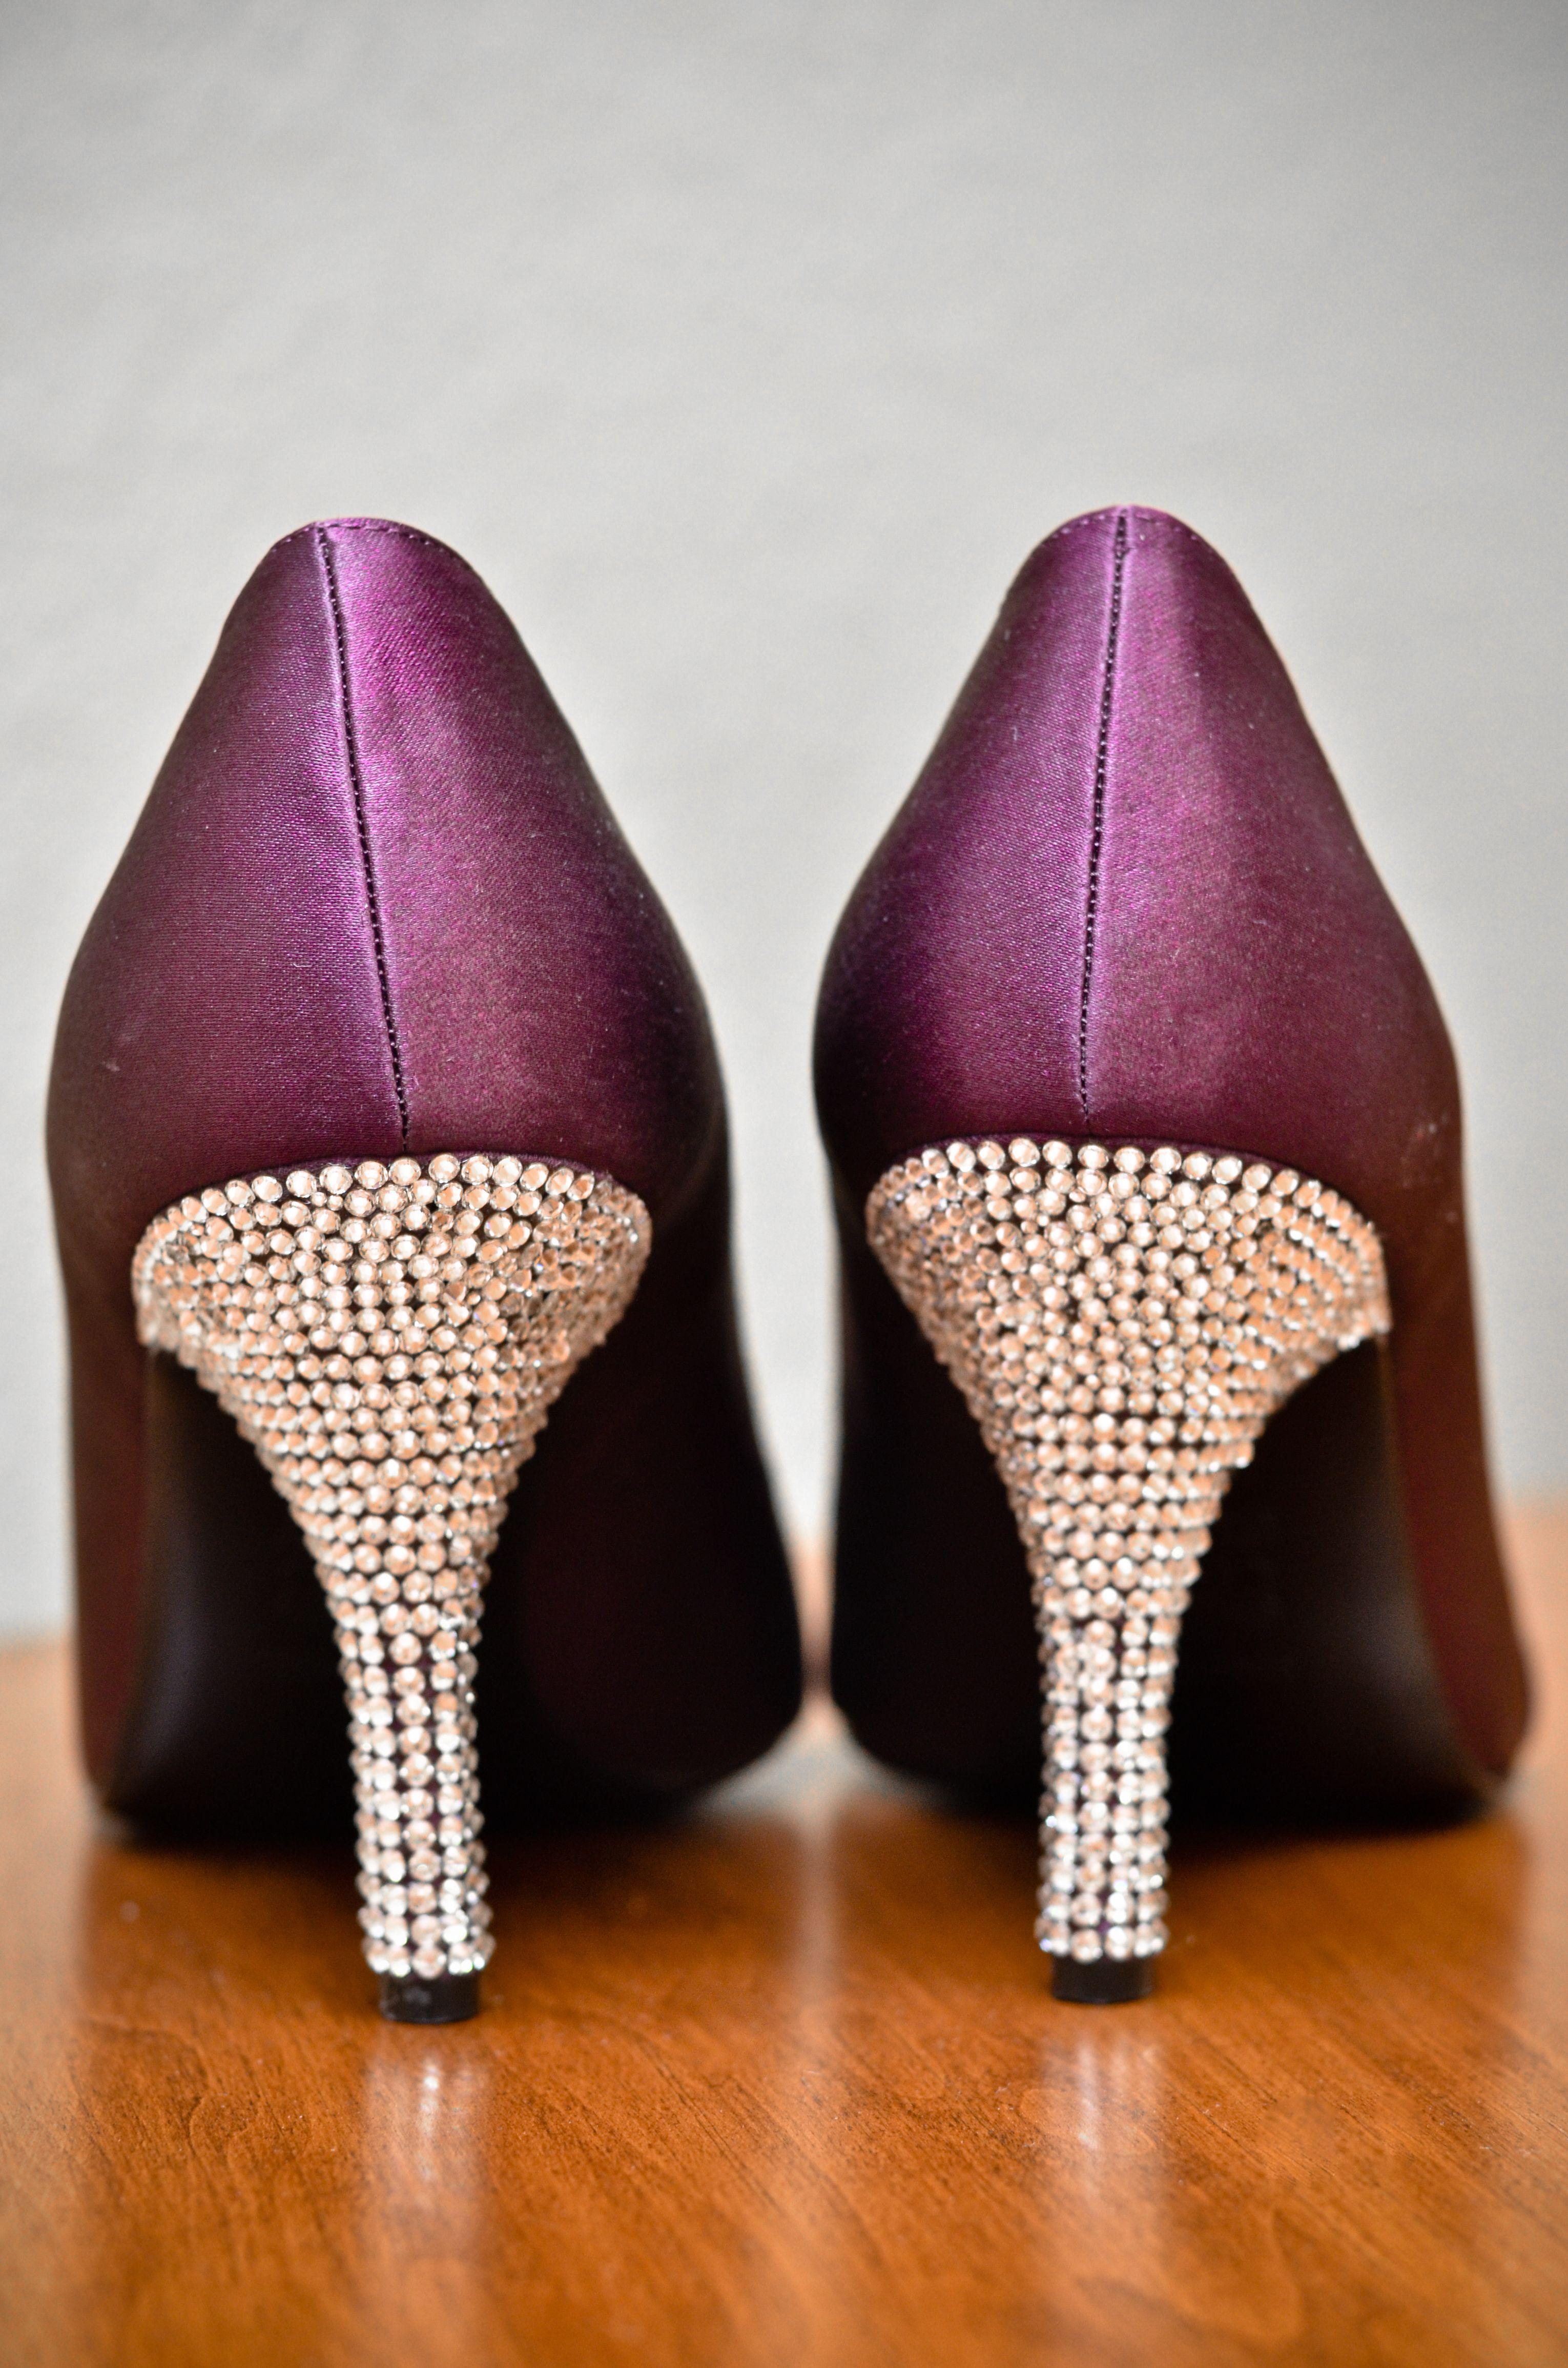 ed14af42f45b Heels are encrusted in swarvoski crystal she hand glued  3 Purple wedding  shoes swarvoski wedding shoes purple peep toe pumps